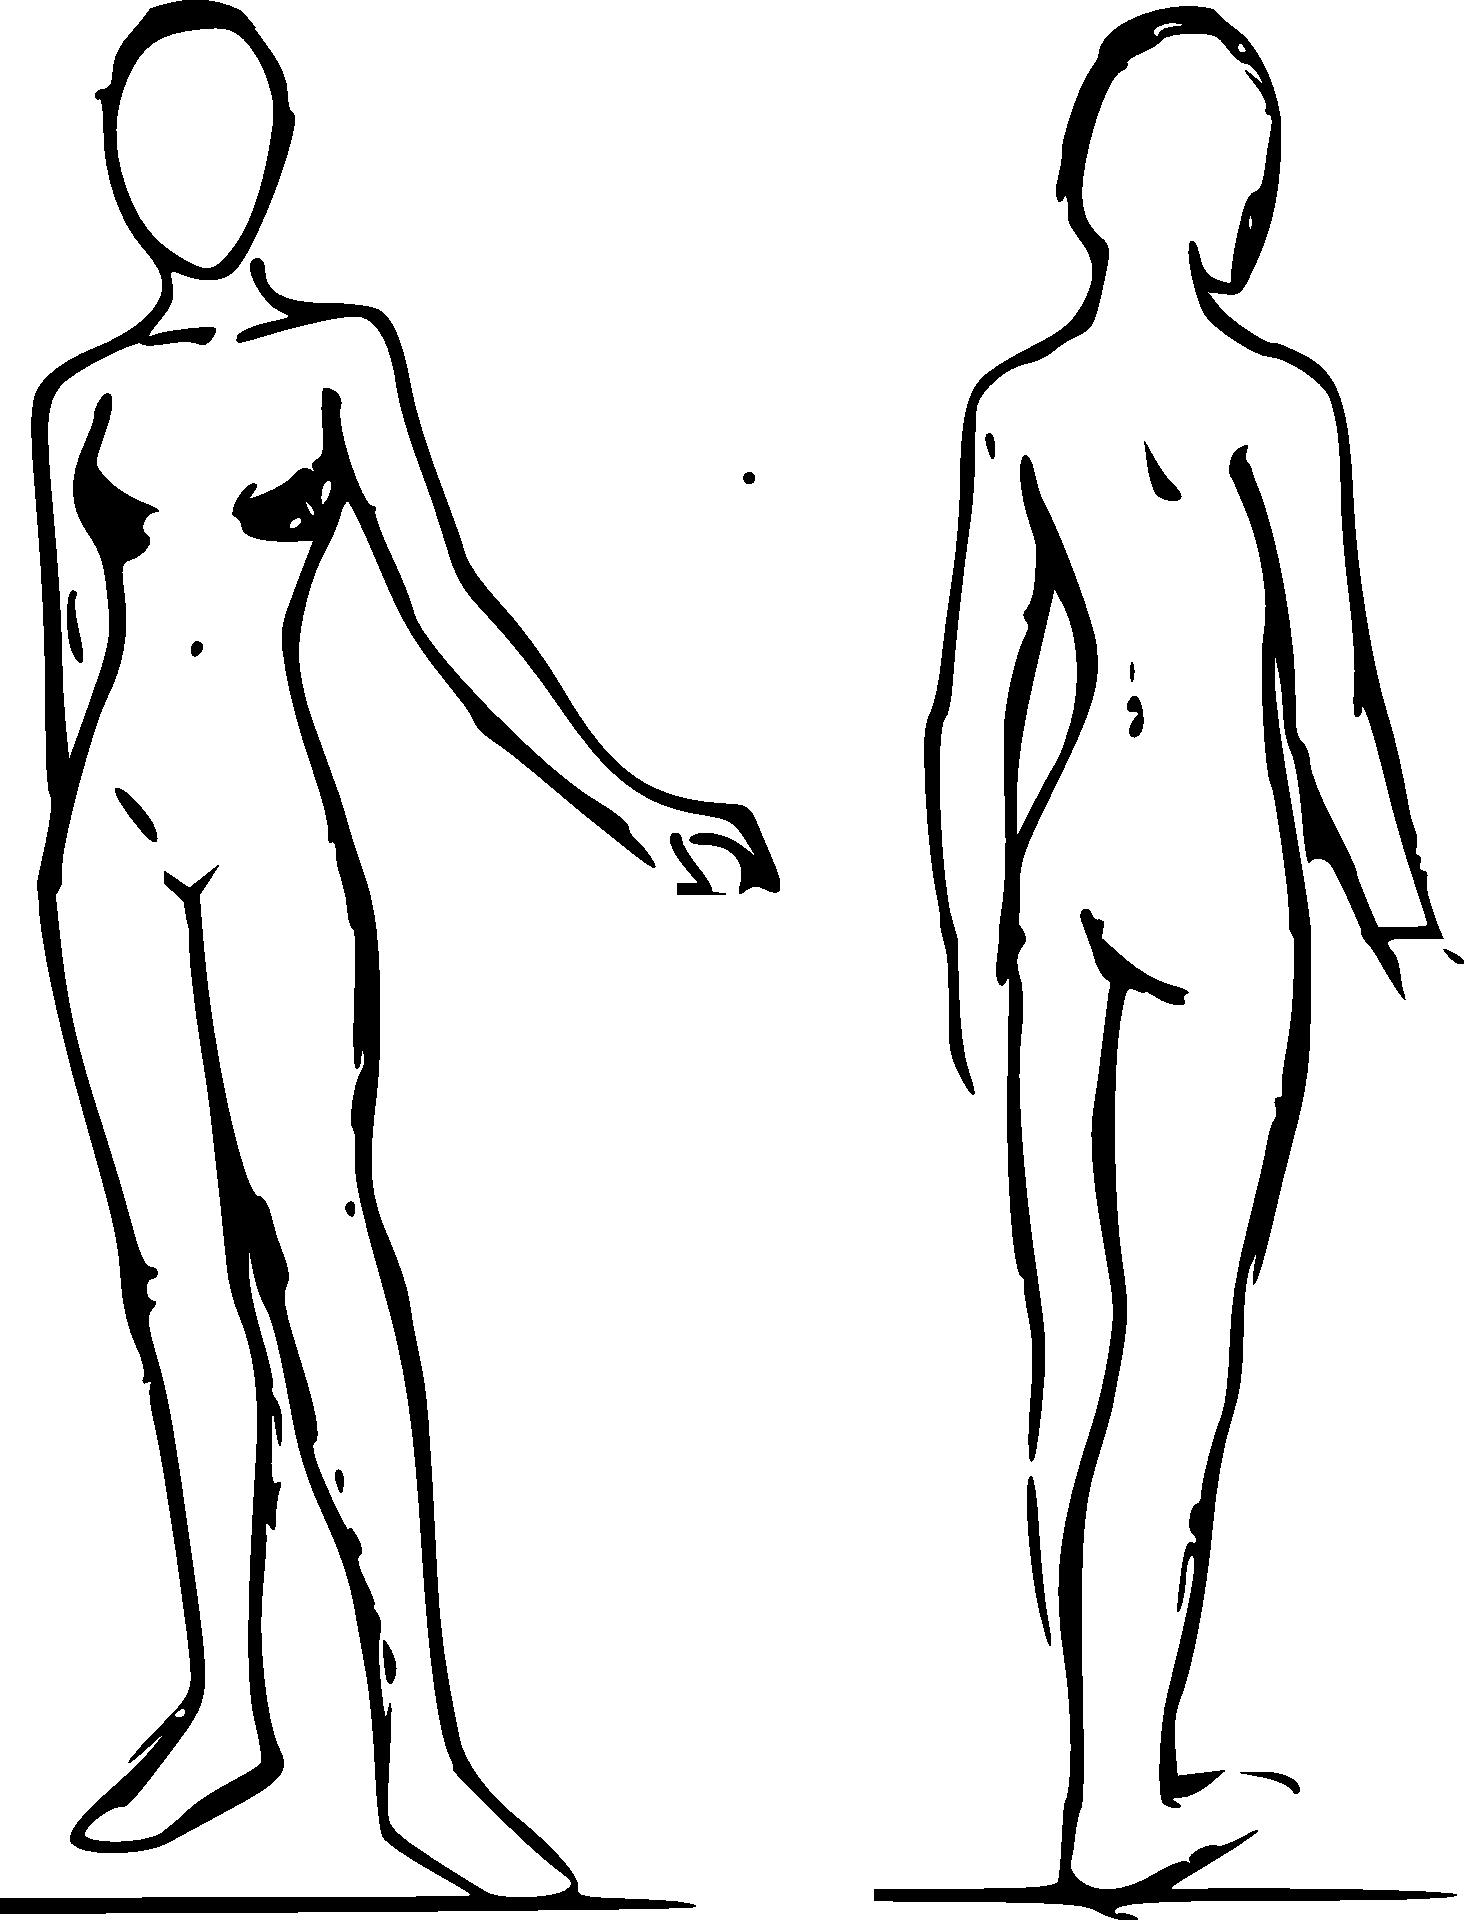 Female Bodies Sketch Free Image